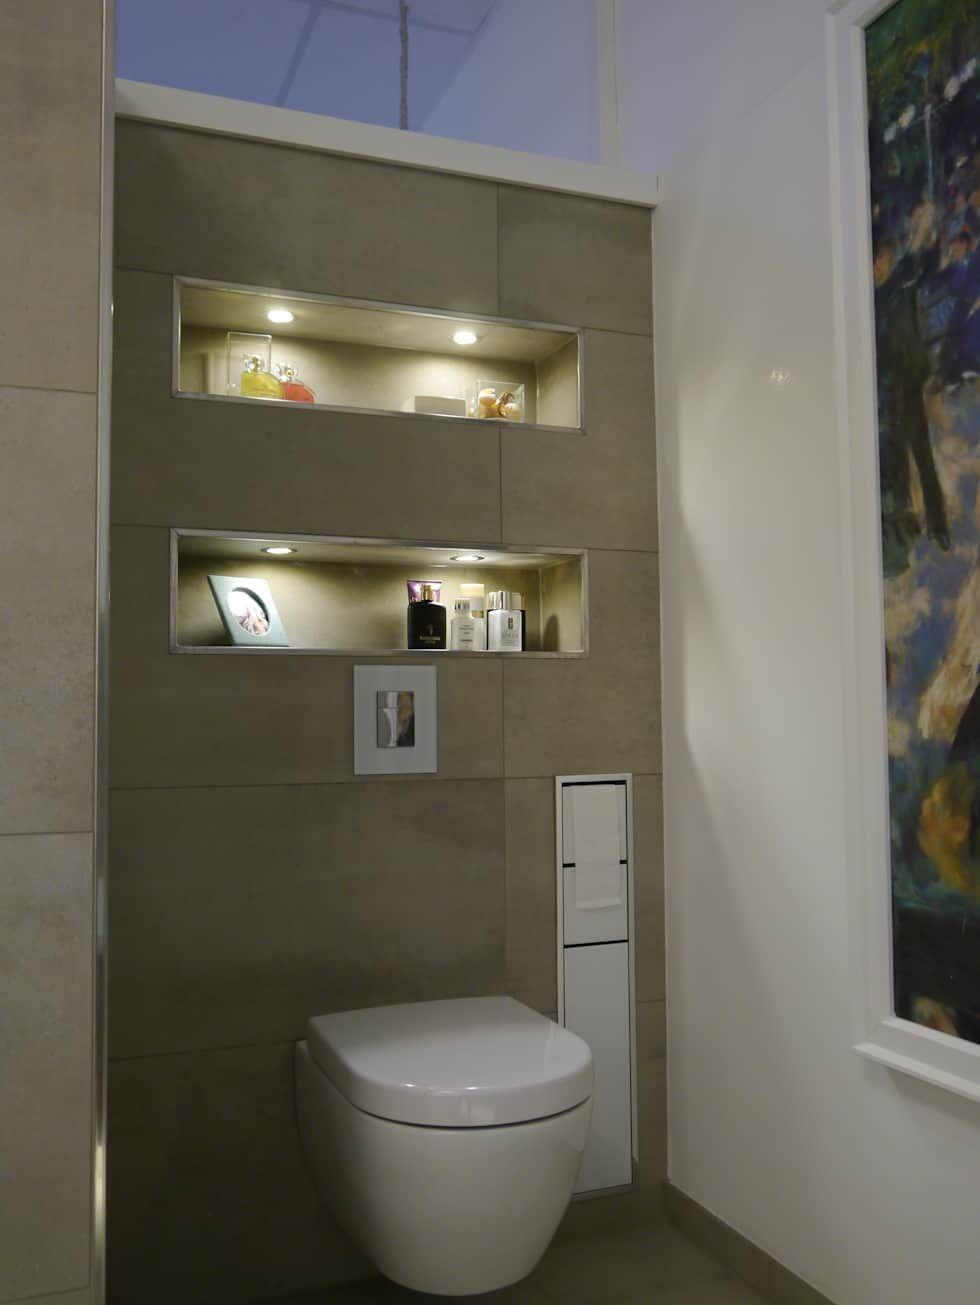 badezimmer ausstellung, ausstellung : moderne badezimmer von sascha kregeler badezimmer, Badezimmer